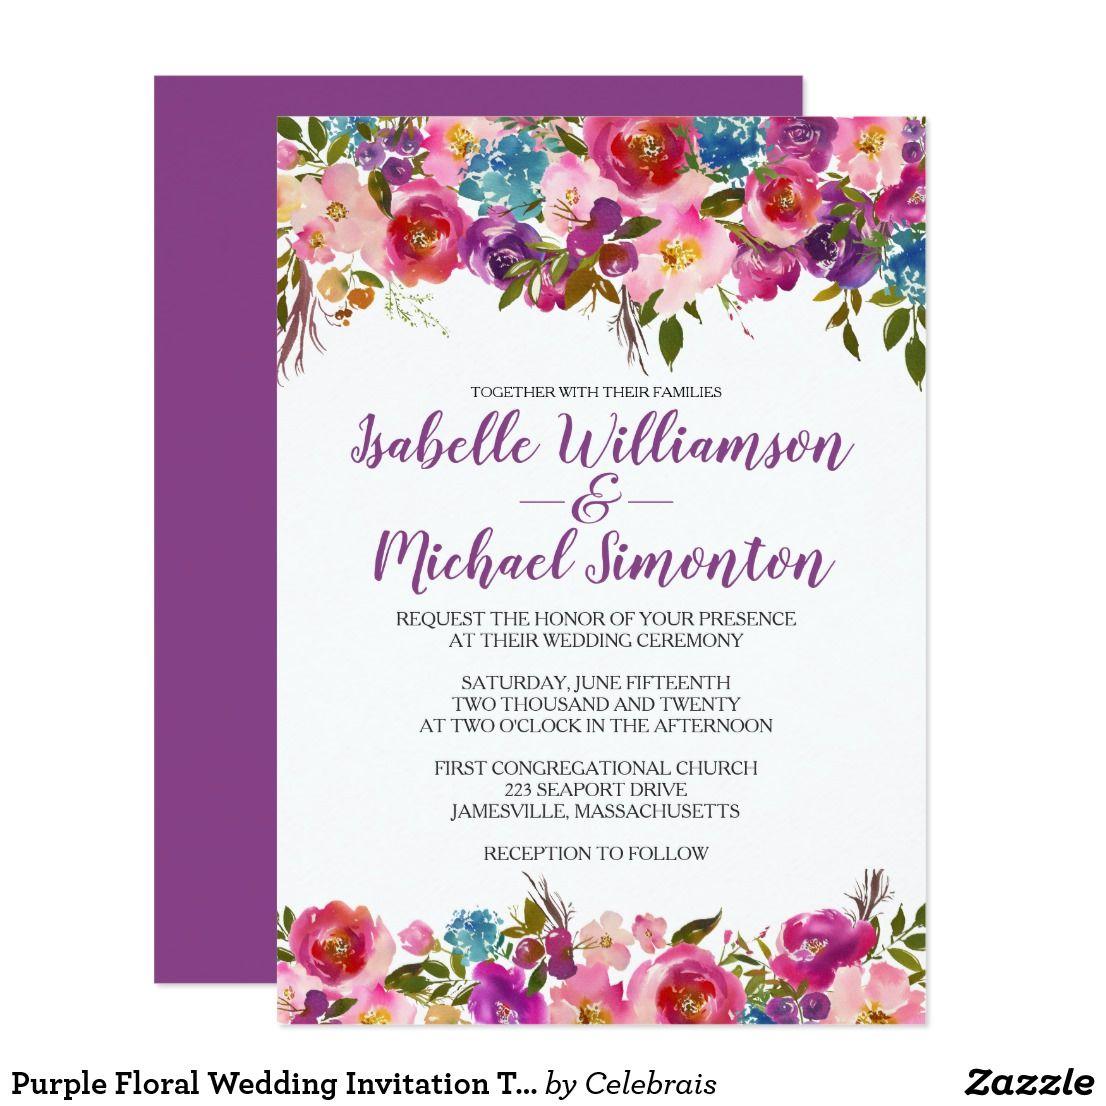 Purple Floral Wedding Invitation Template: Lilac Wedding Invitation Template At Reisefeber.org